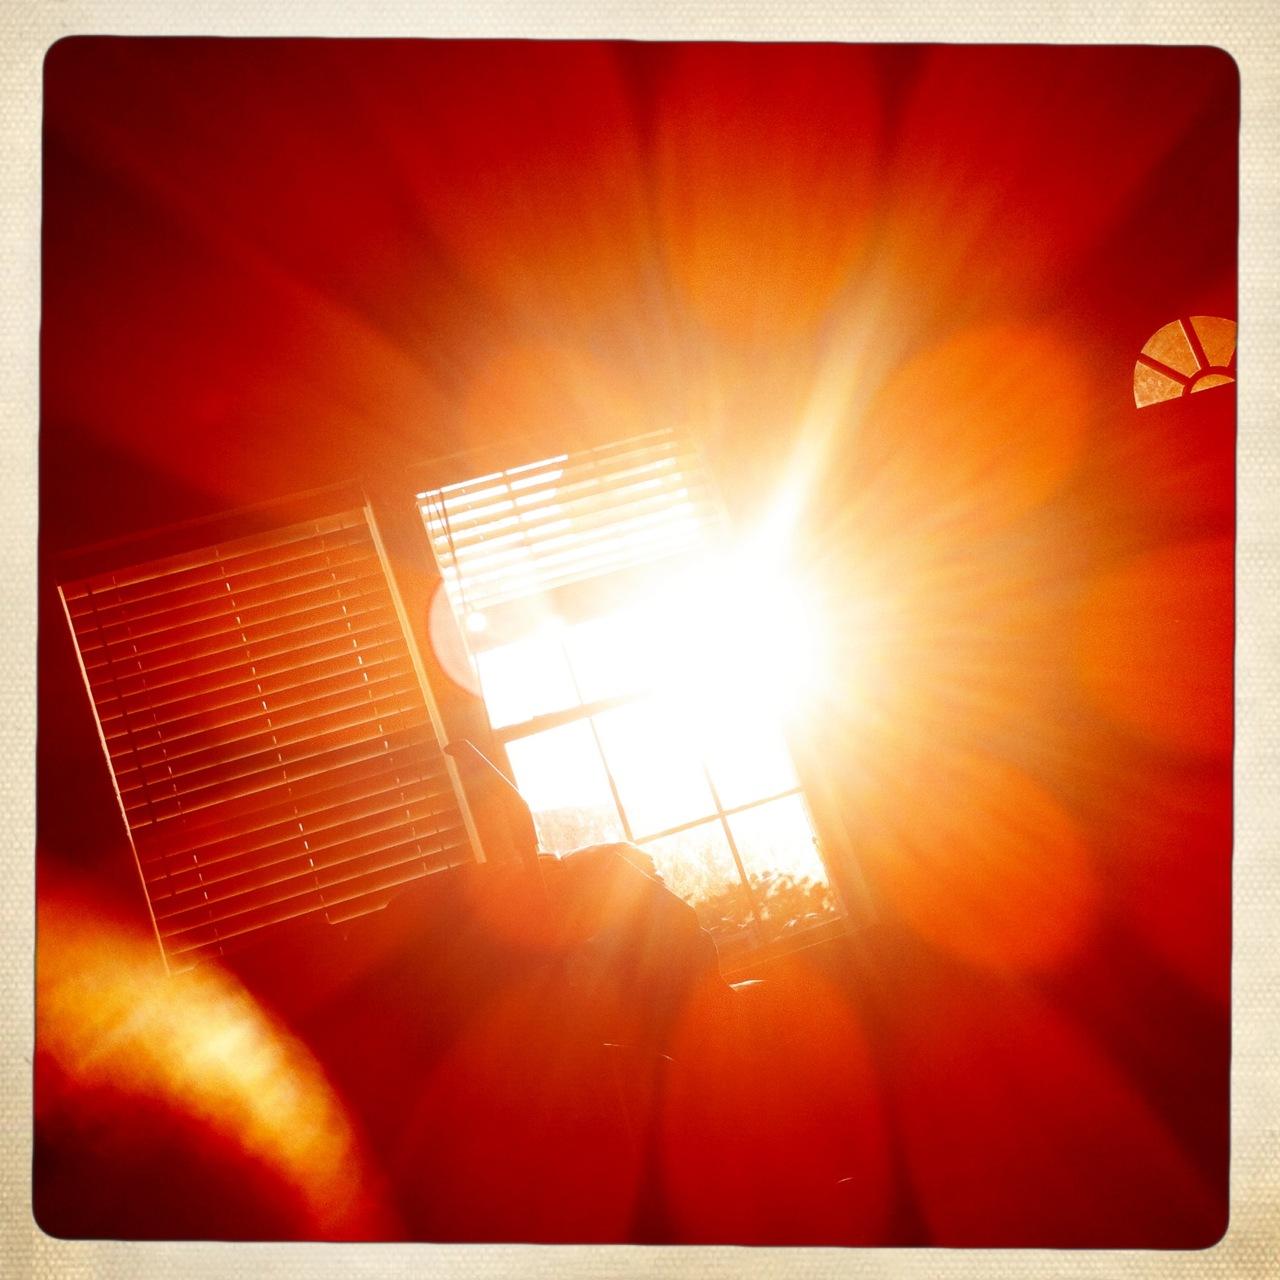 Good morning sunrise through my window 4 Kaimal Mark II Lens, Ina's 1969 Film, No Flash,